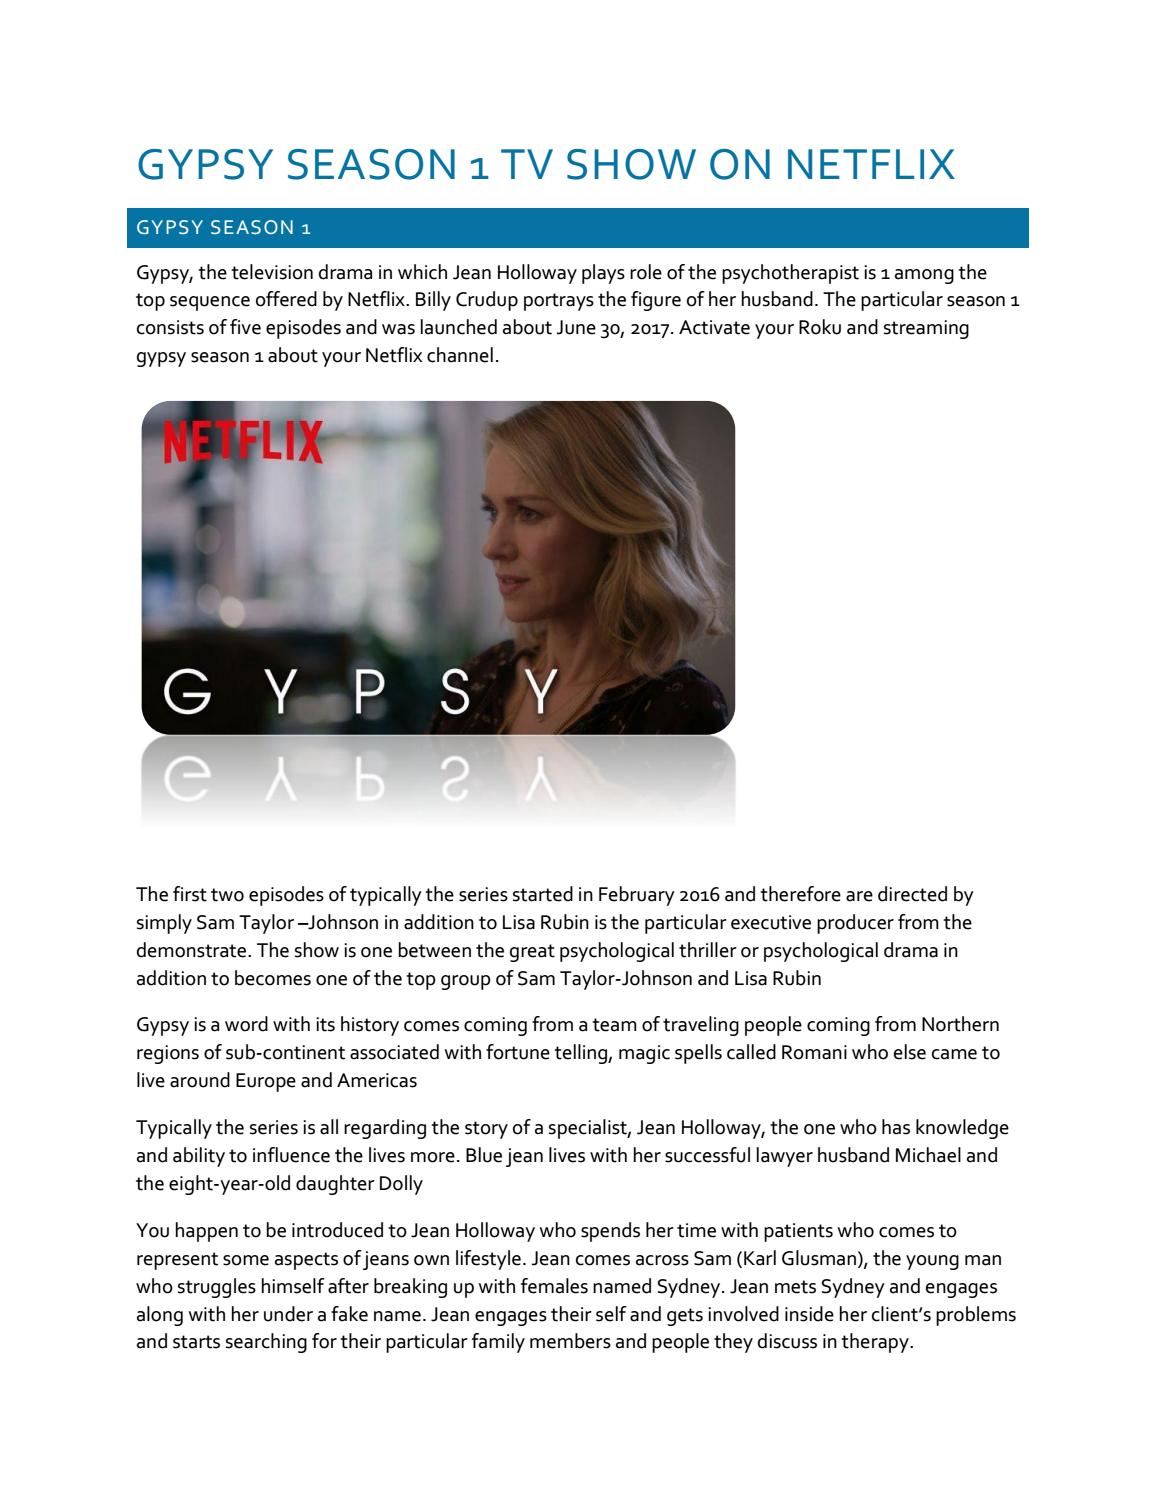 Top Psychological Thrillers On Netflix 2016 — TTCT